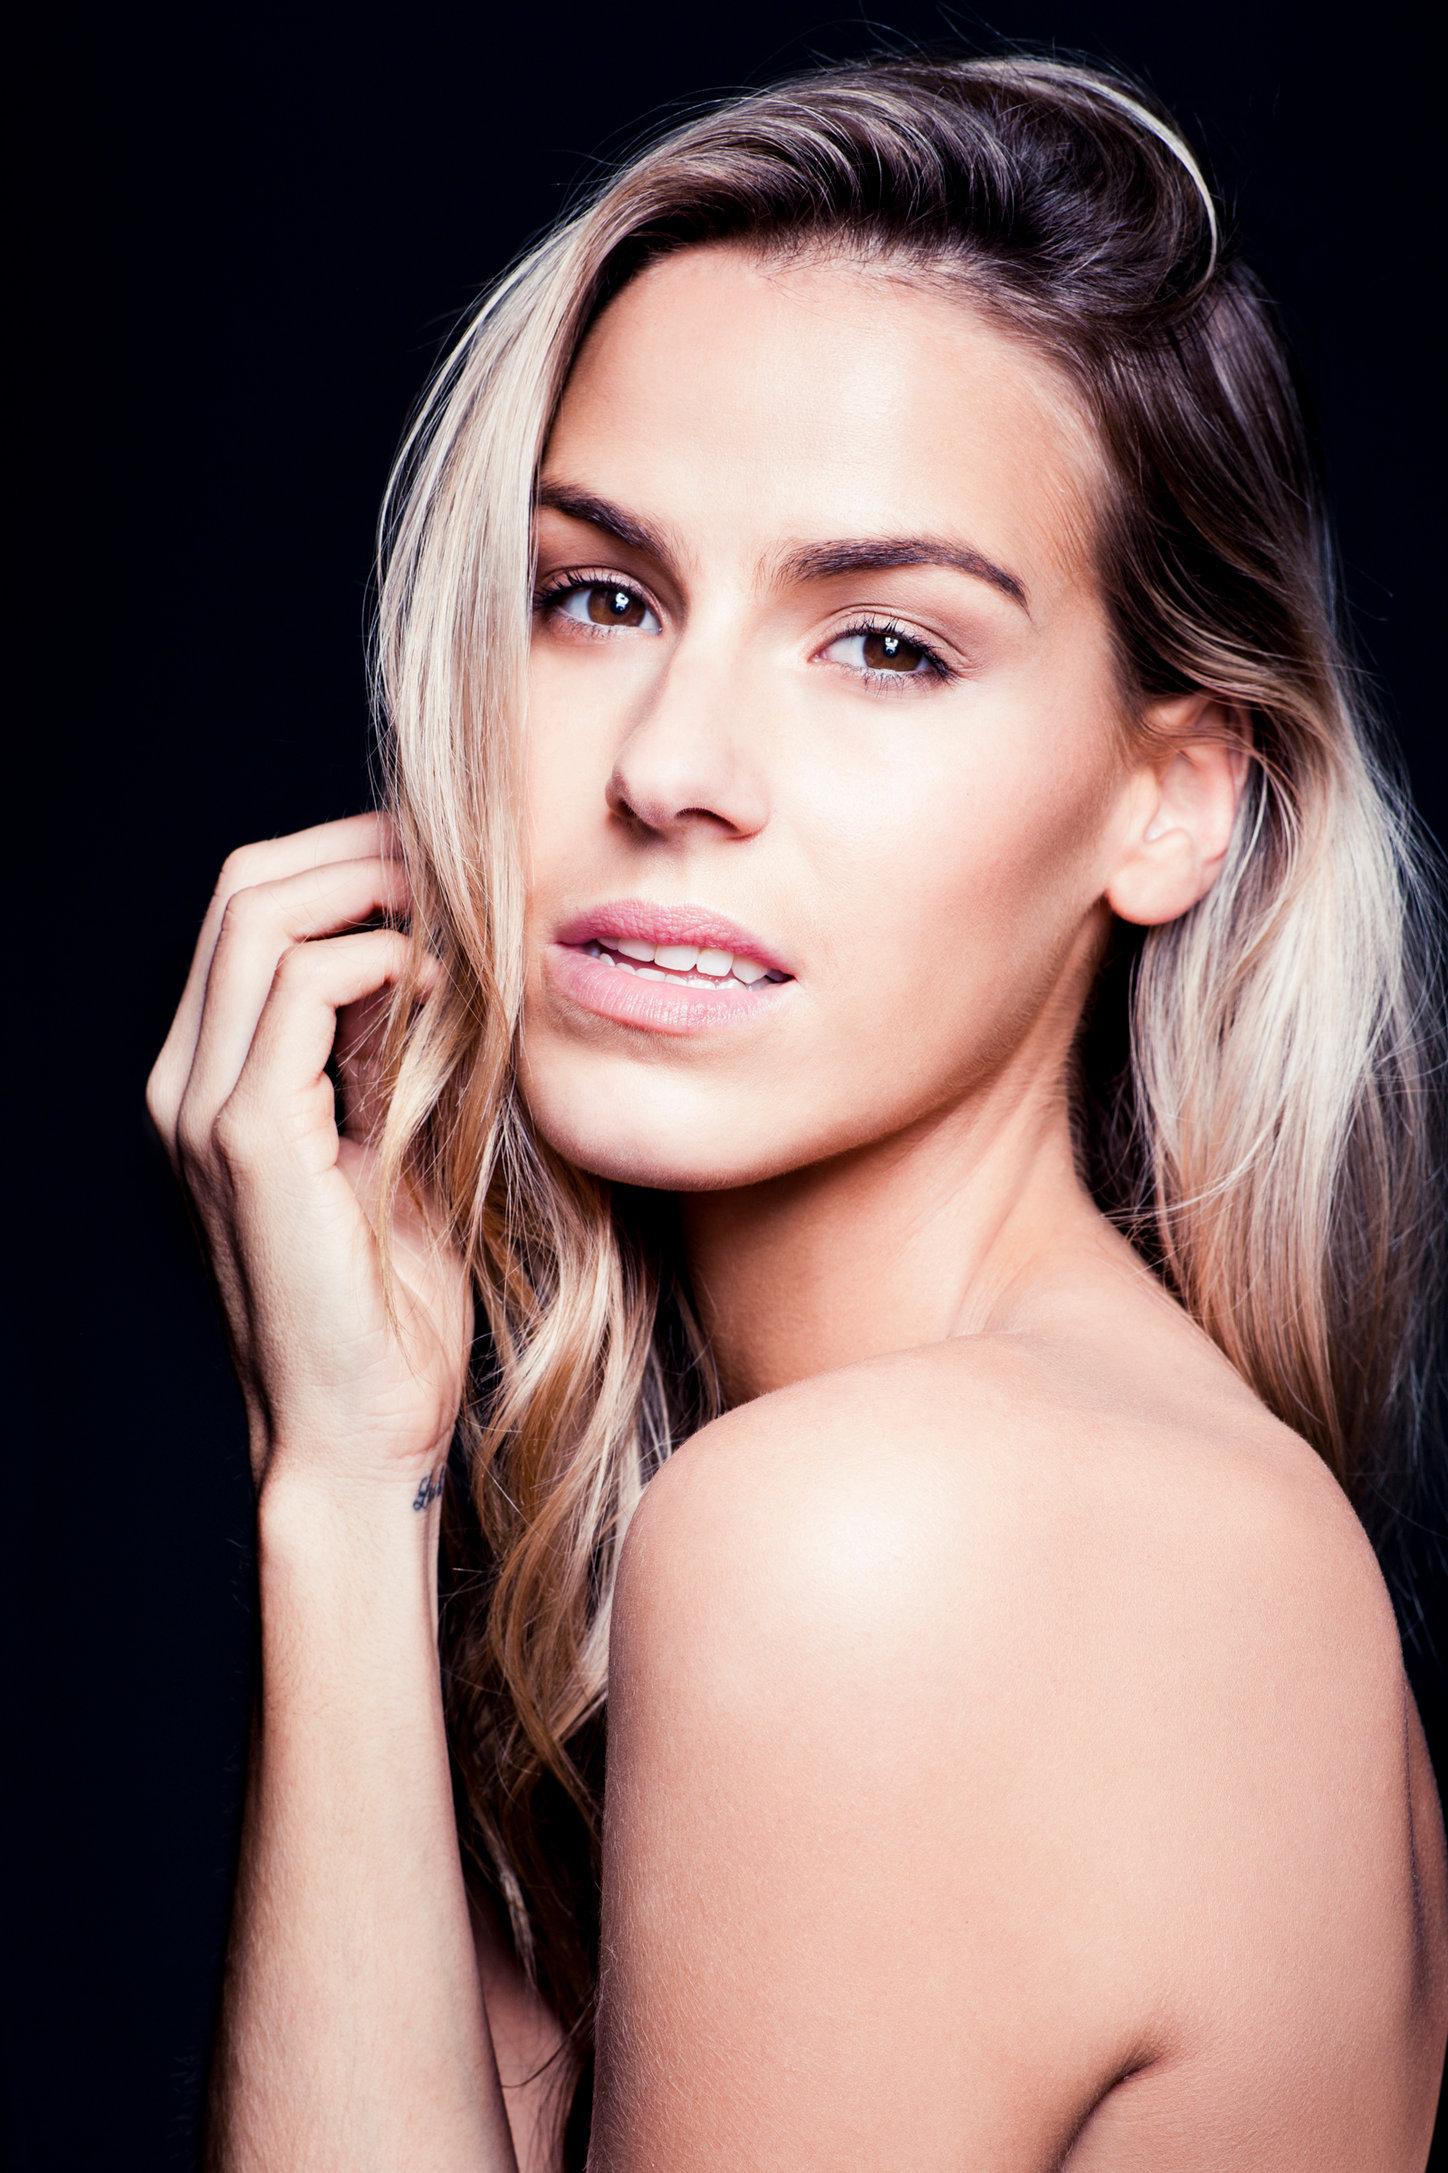 Sarah - Beauty-119-Edit.tif